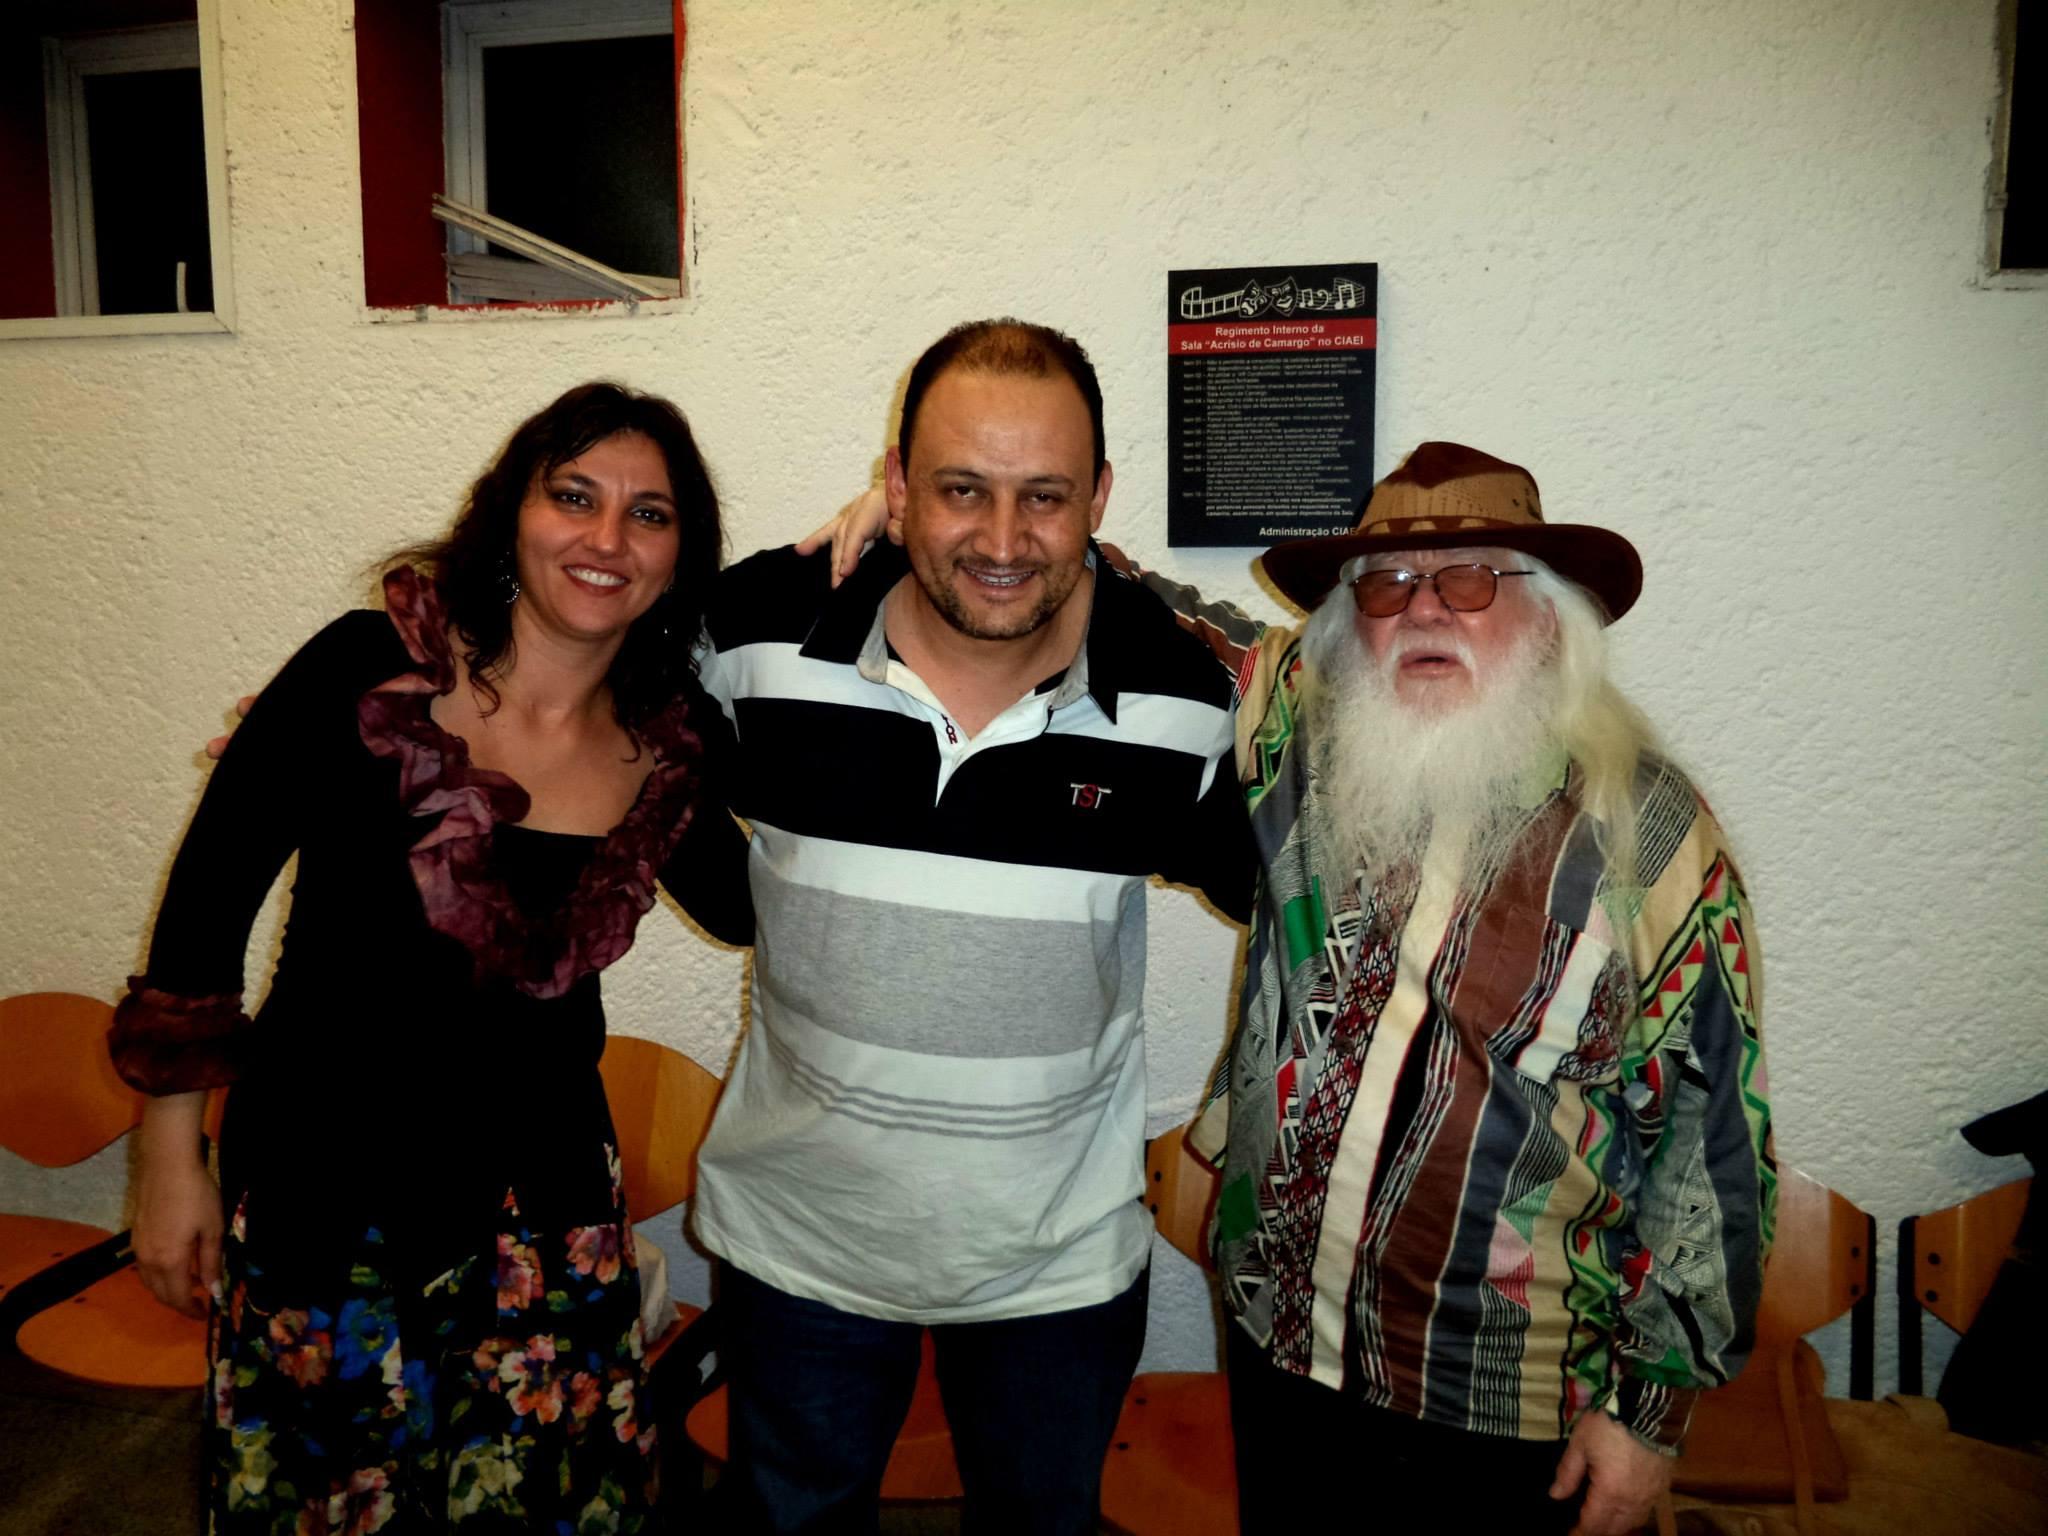 Lincoln, Hermeto e Aline Moreira